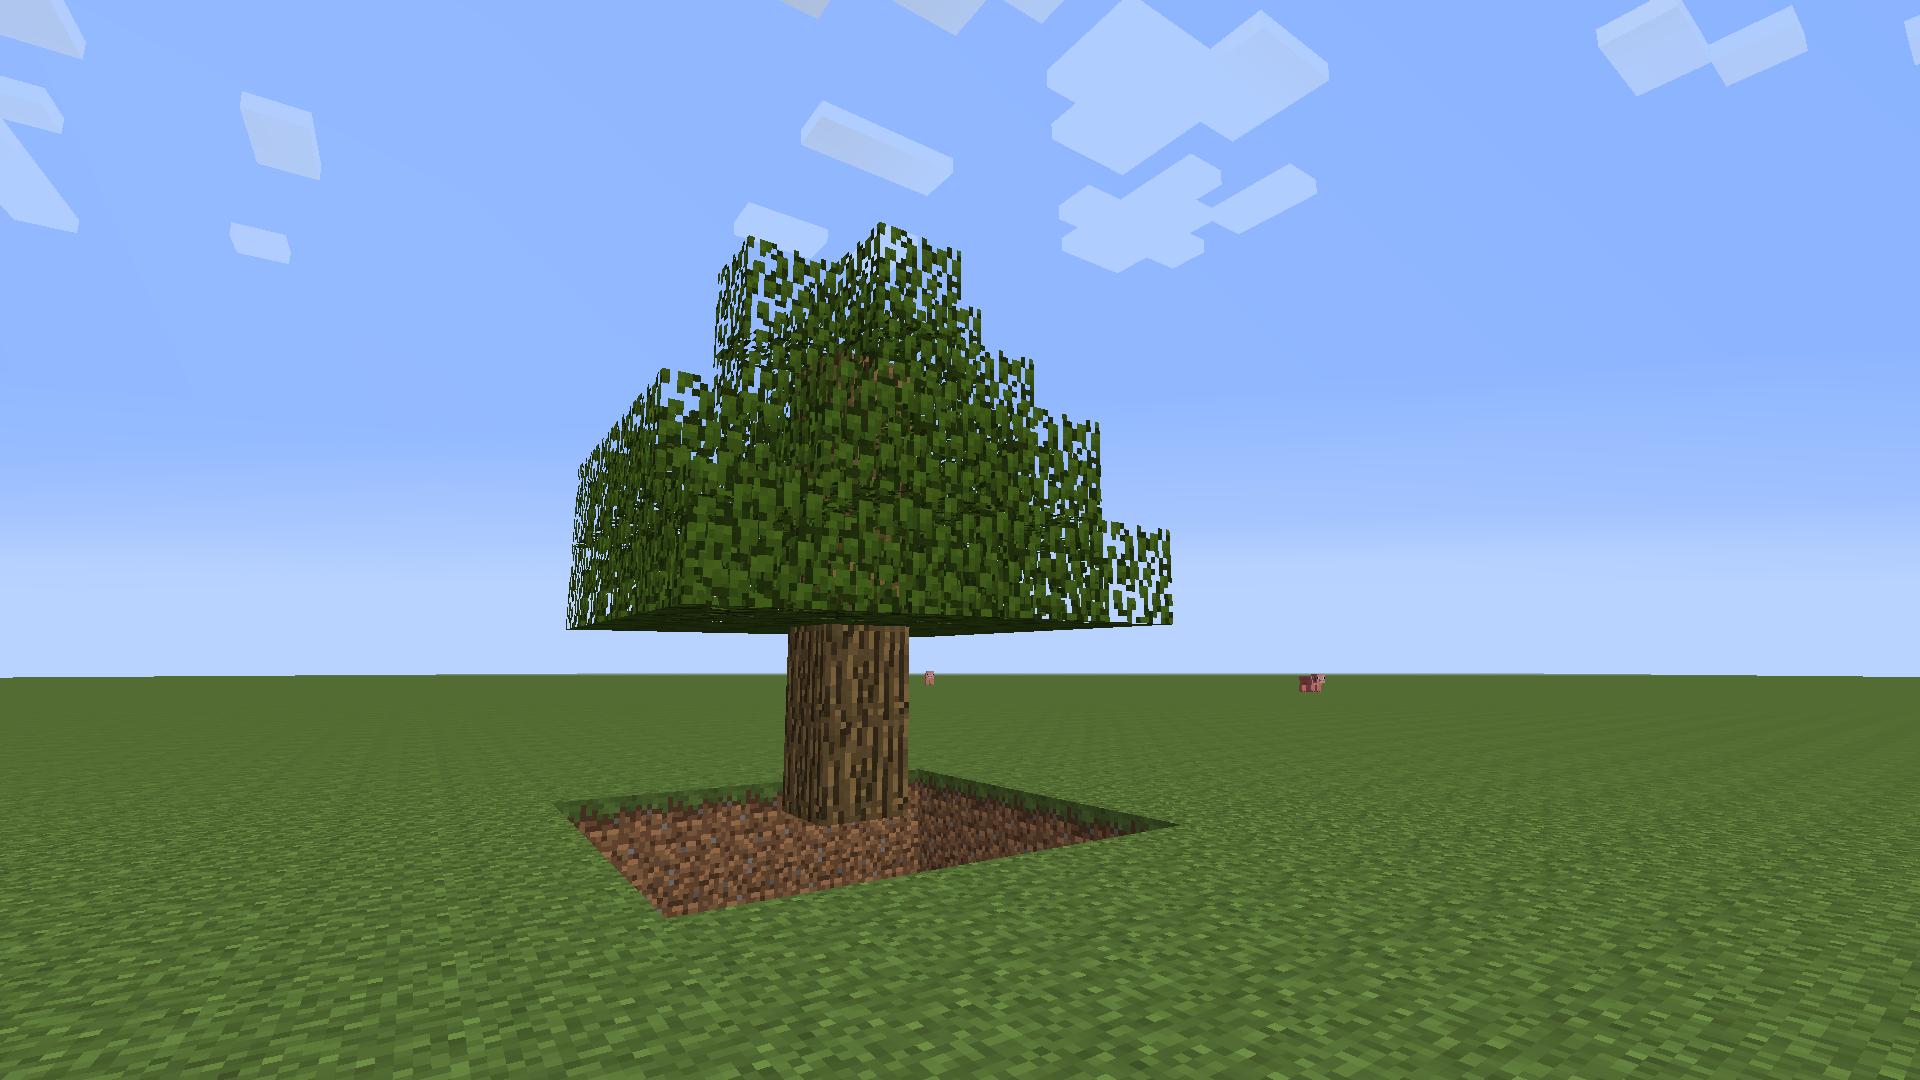 minecraft comment faire un arbre pi g. Black Bedroom Furniture Sets. Home Design Ideas